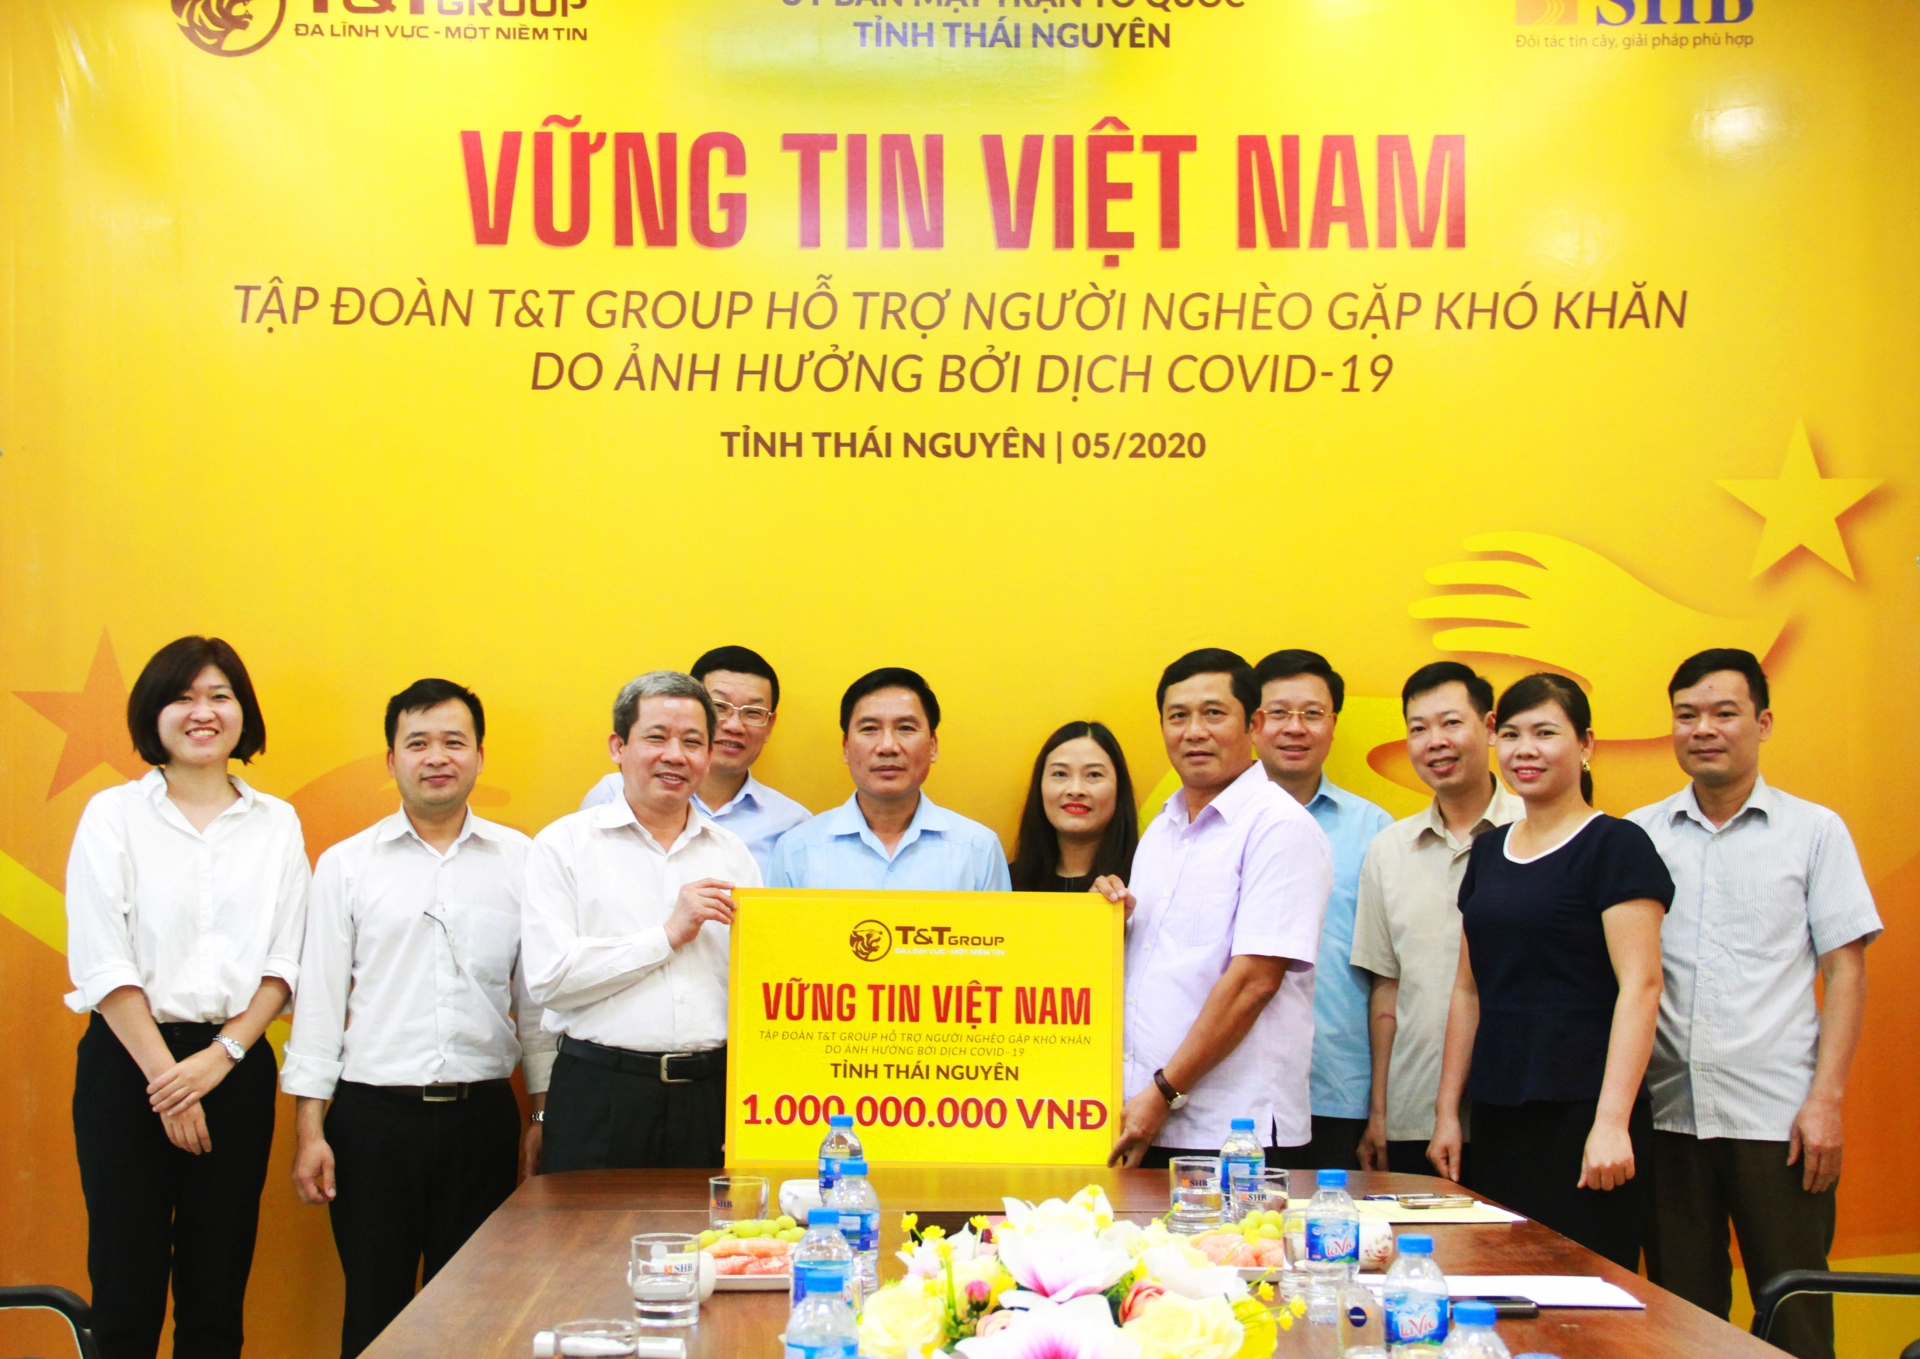 tt group va hanh trinh yeu thuong khi niem tin duoc se chia thi hanh phuc duoc nhan len